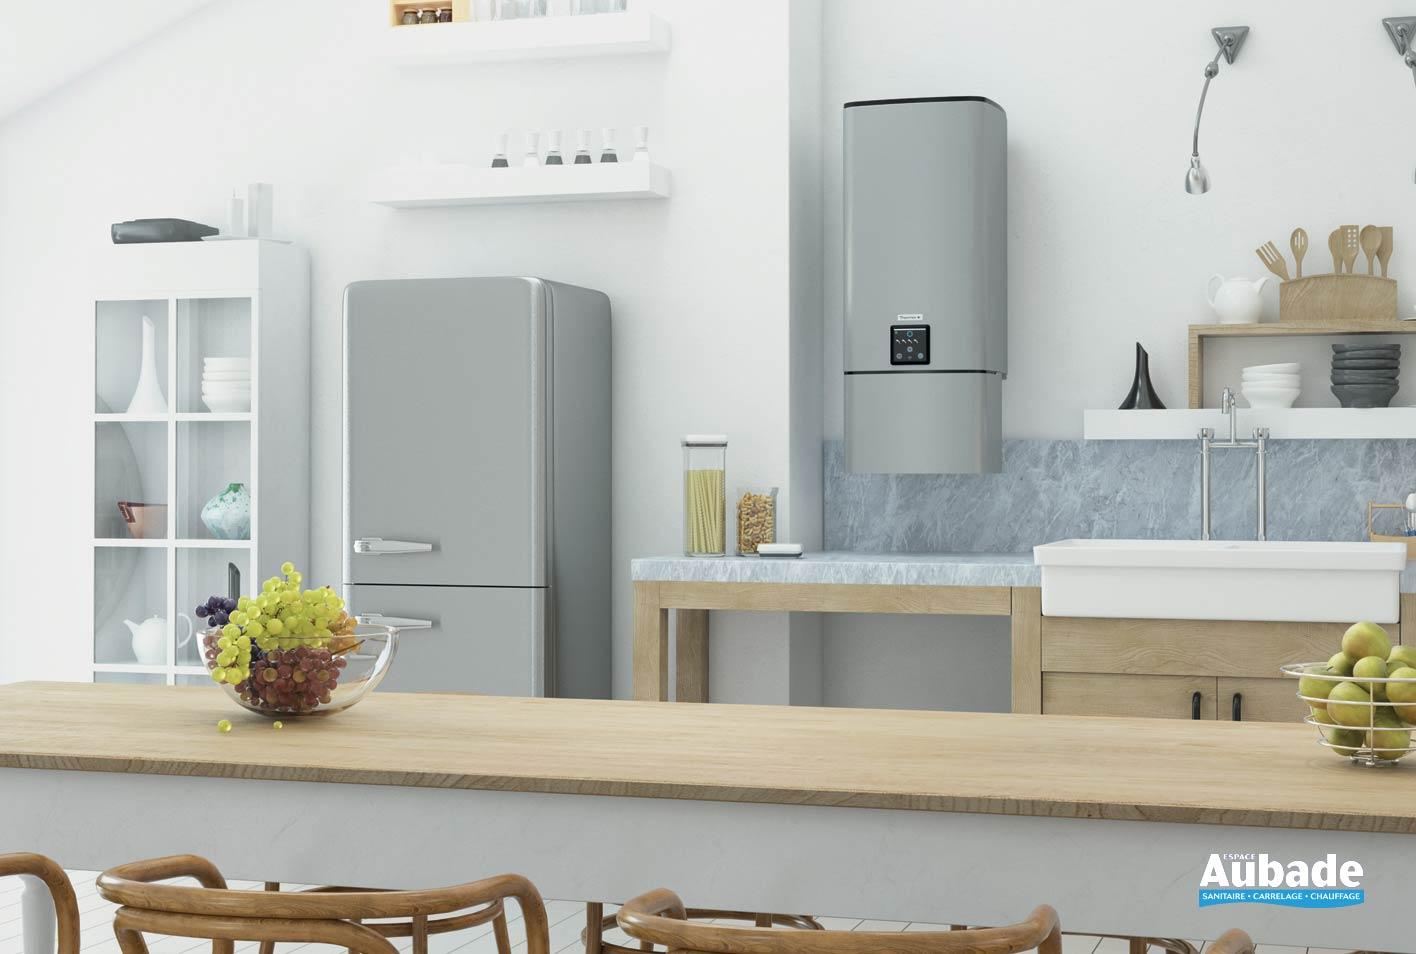 chauffe eau malicio 2 thermor espace aubade. Black Bedroom Furniture Sets. Home Design Ideas